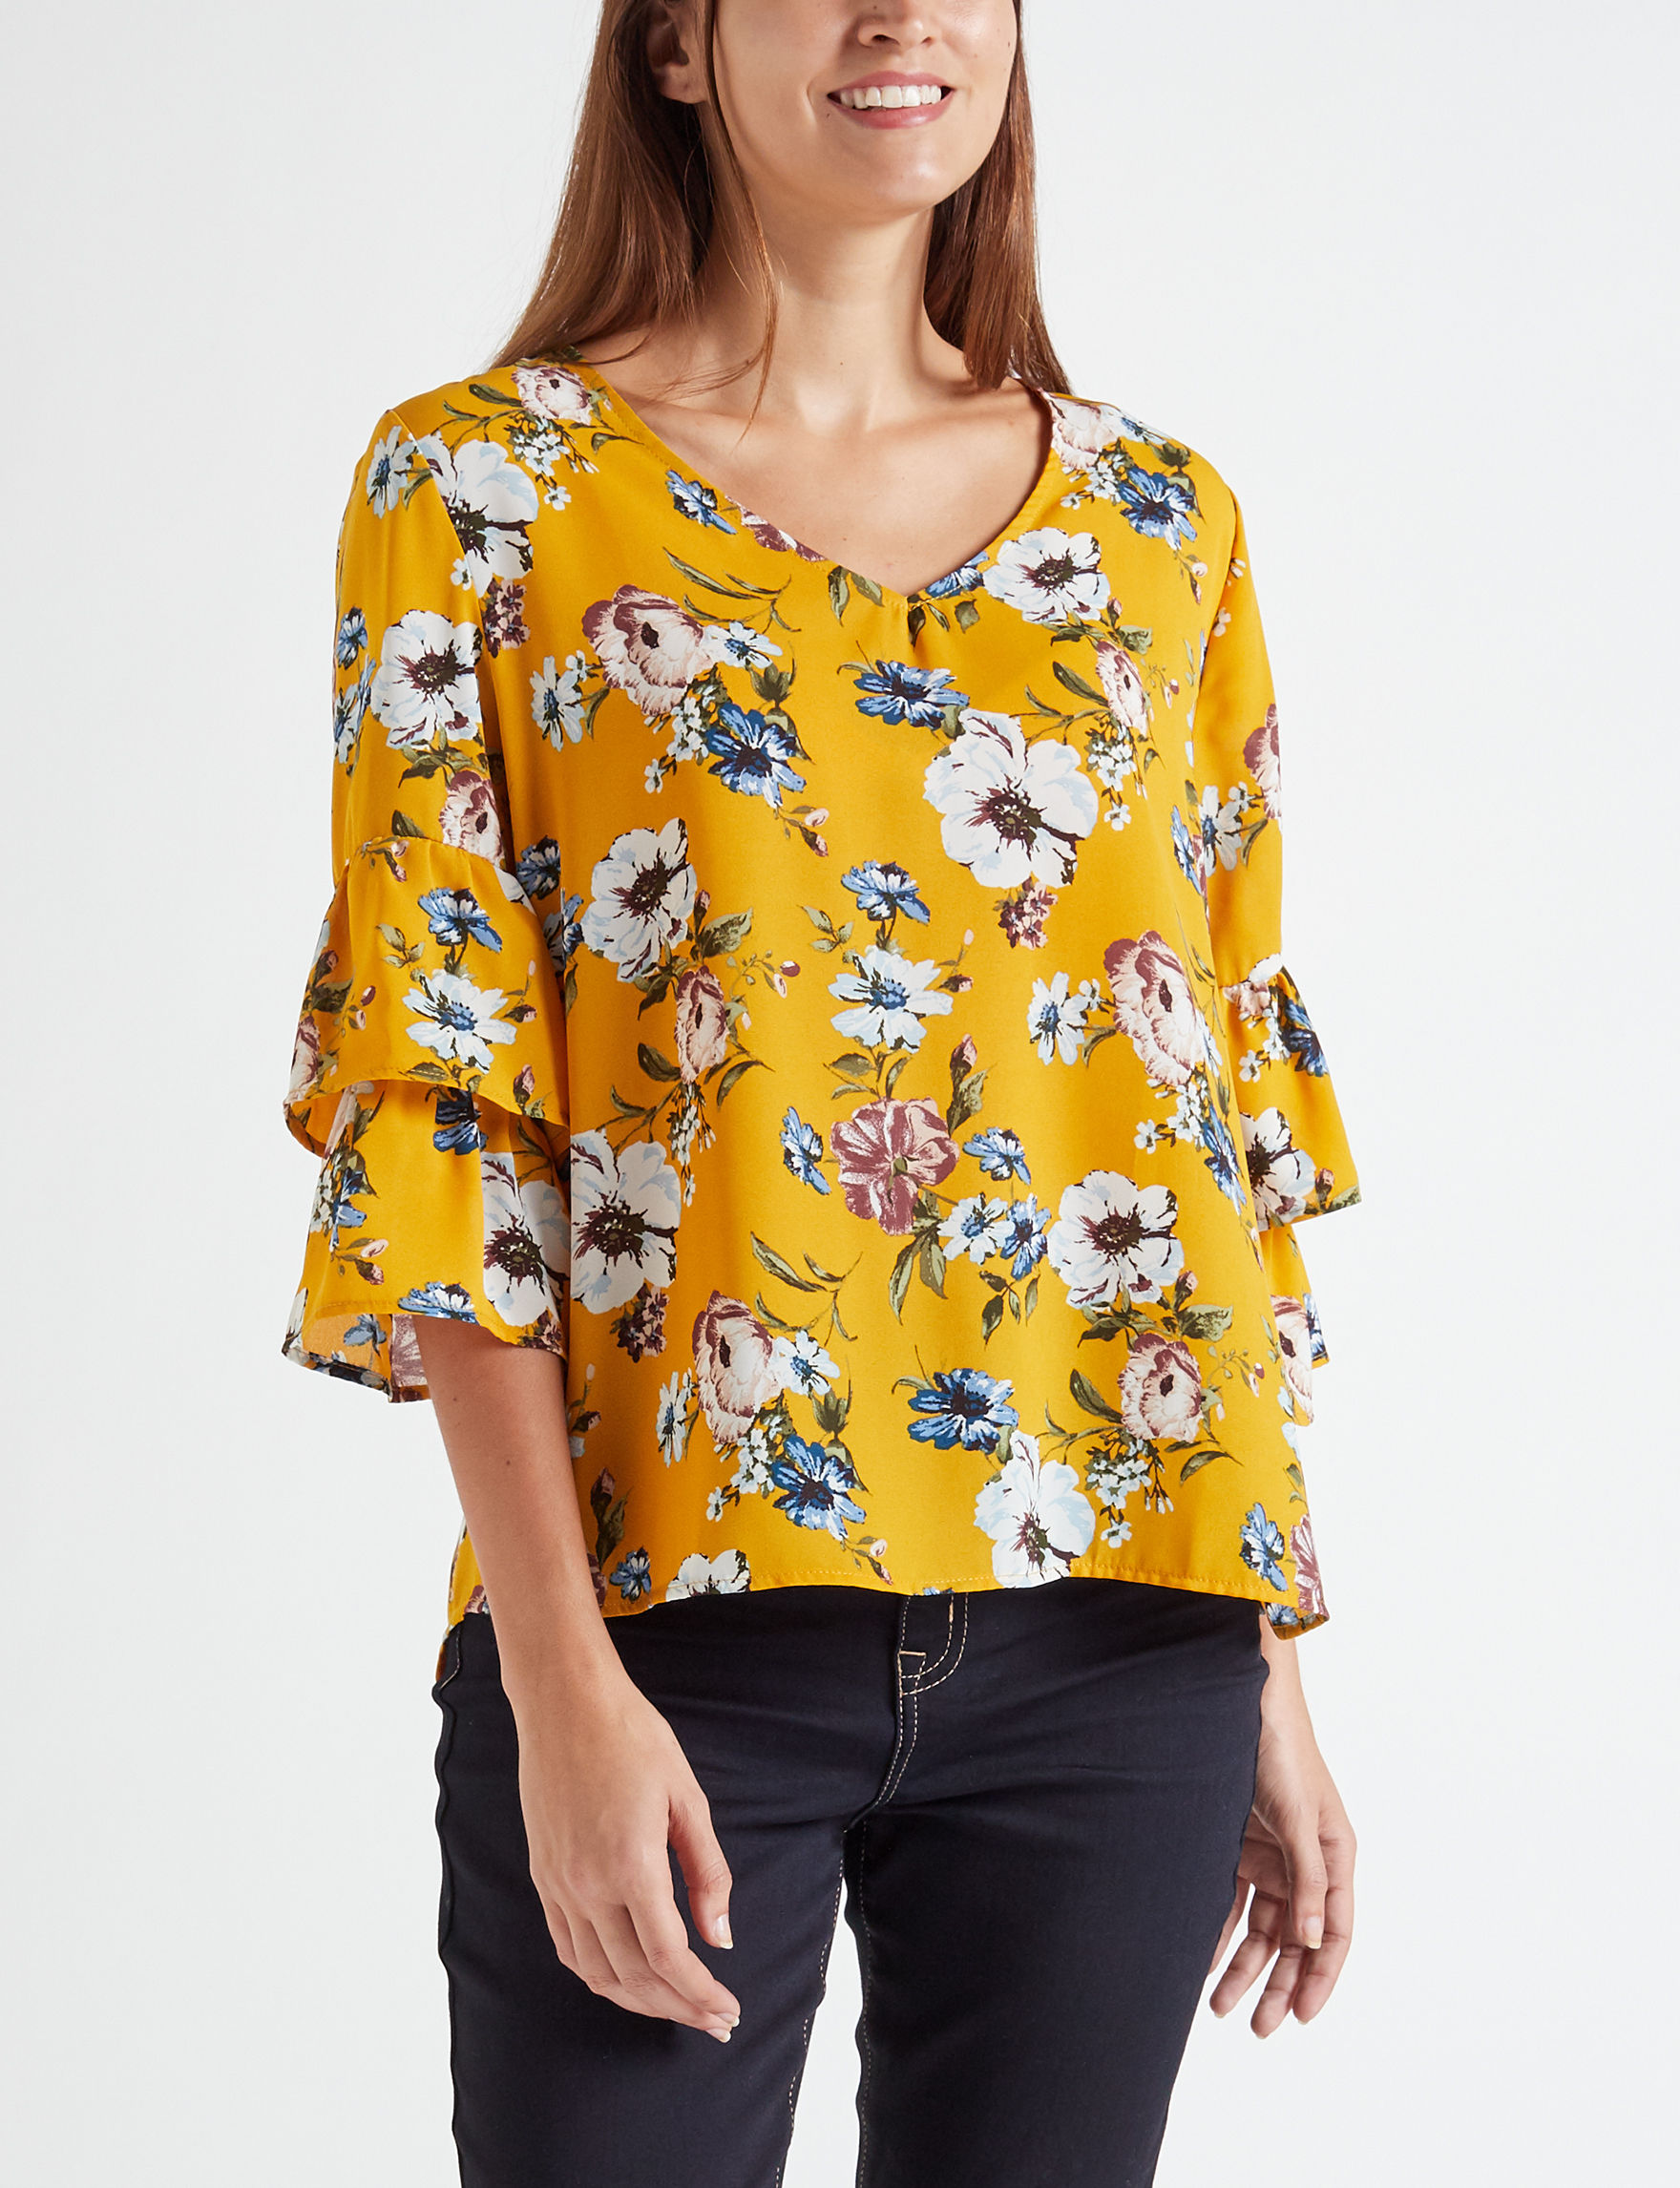 Wishful Park Mustard Shirts & Blouses